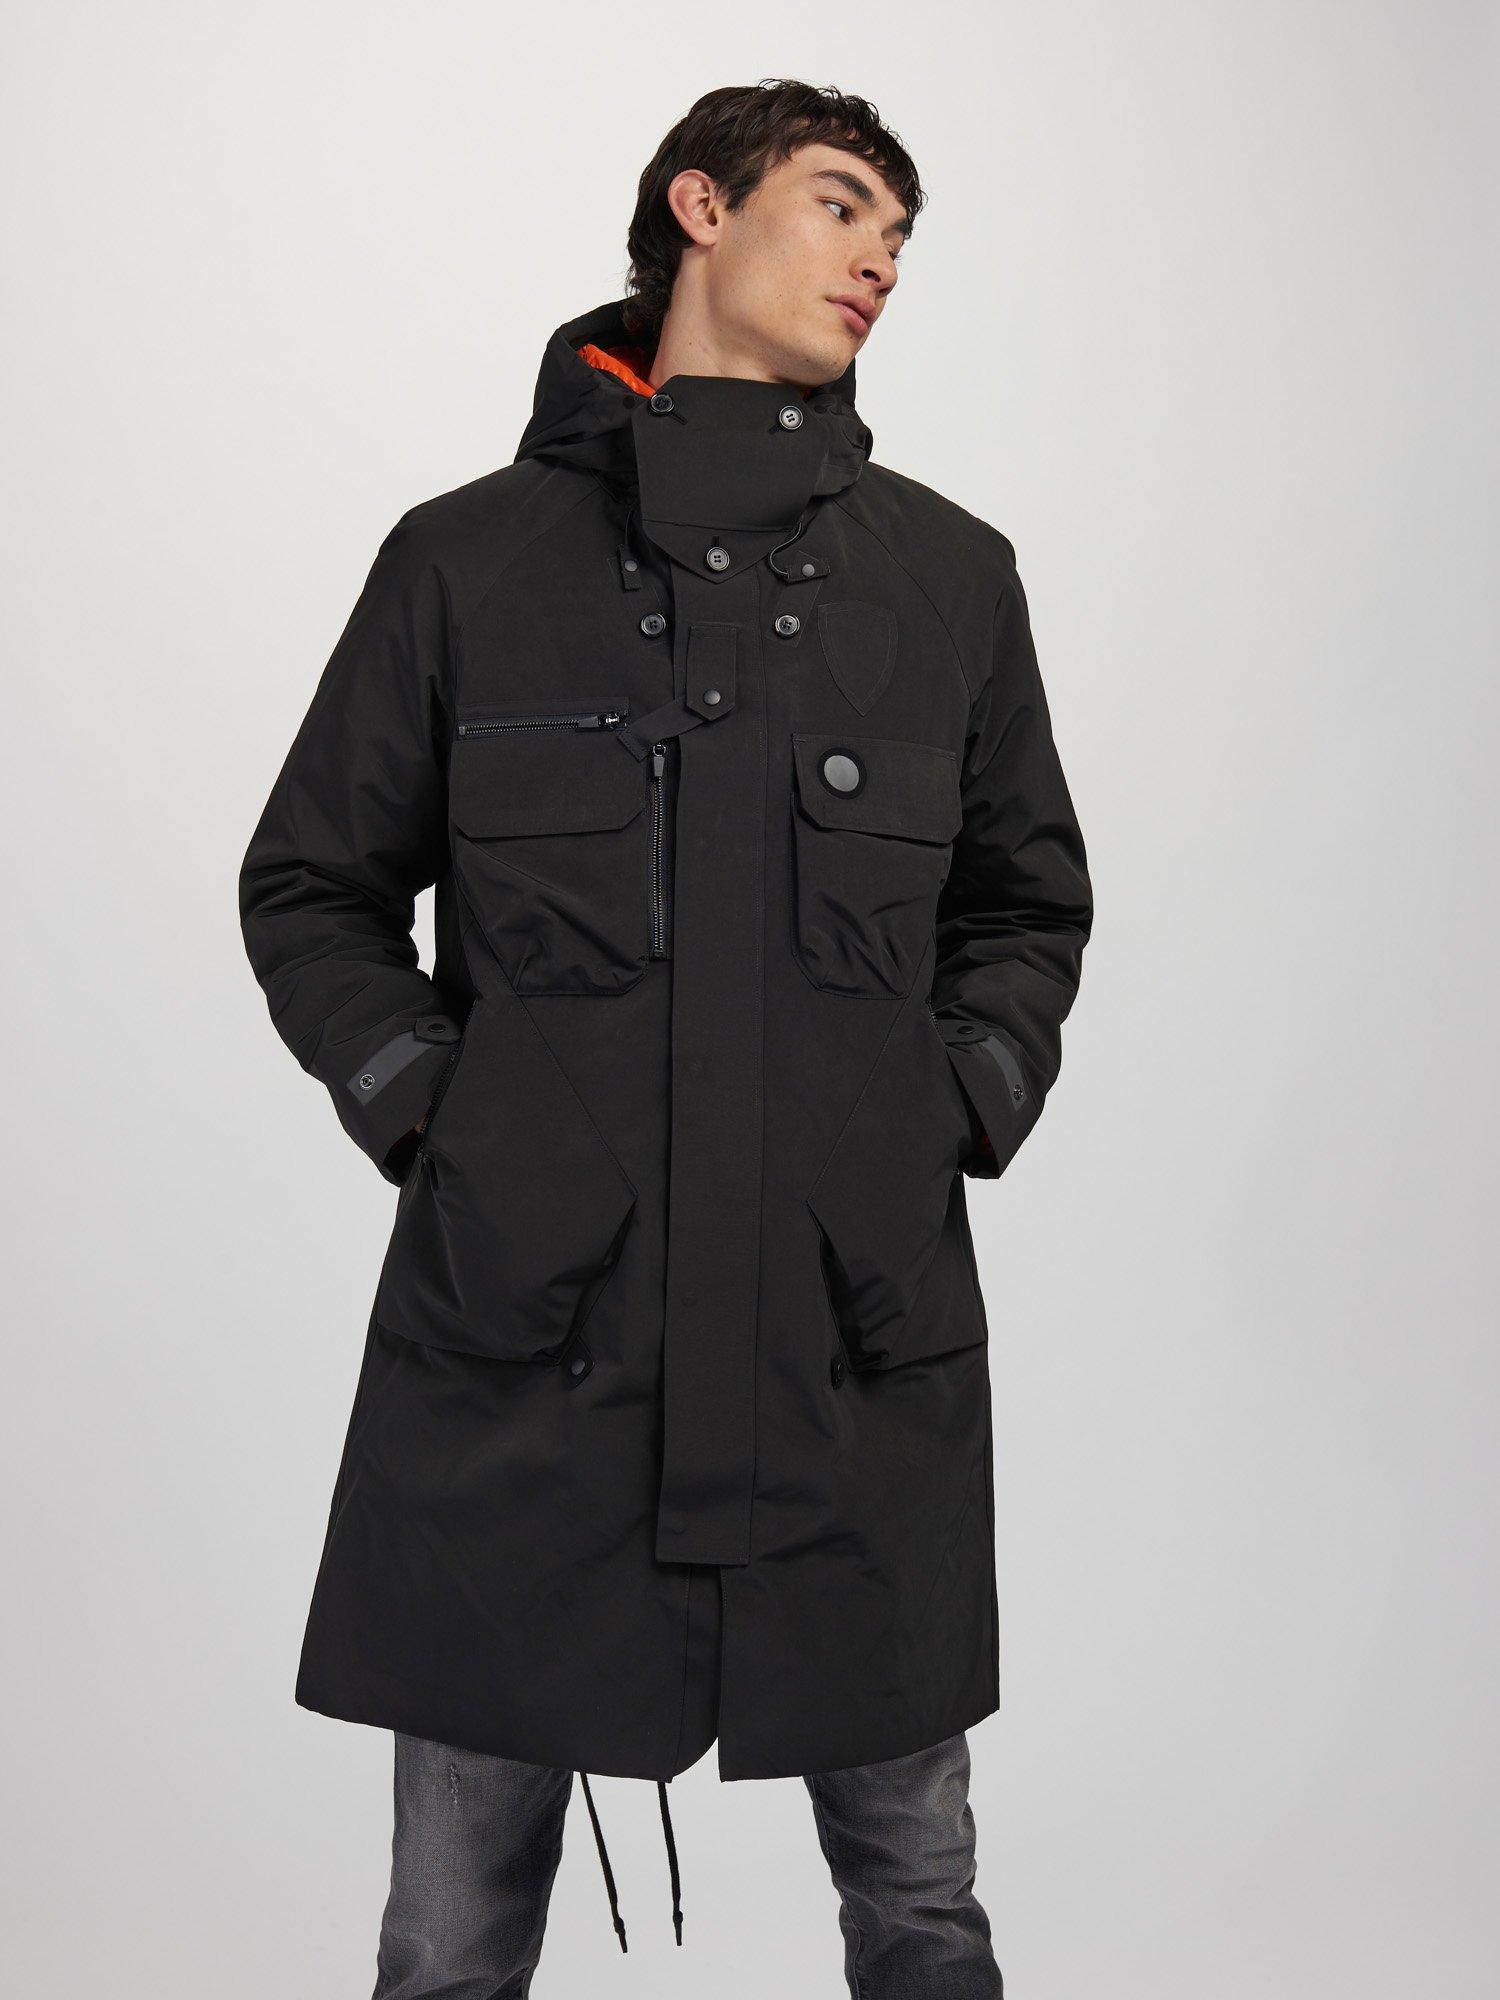 3 LAYER LONG COAT - Blauer